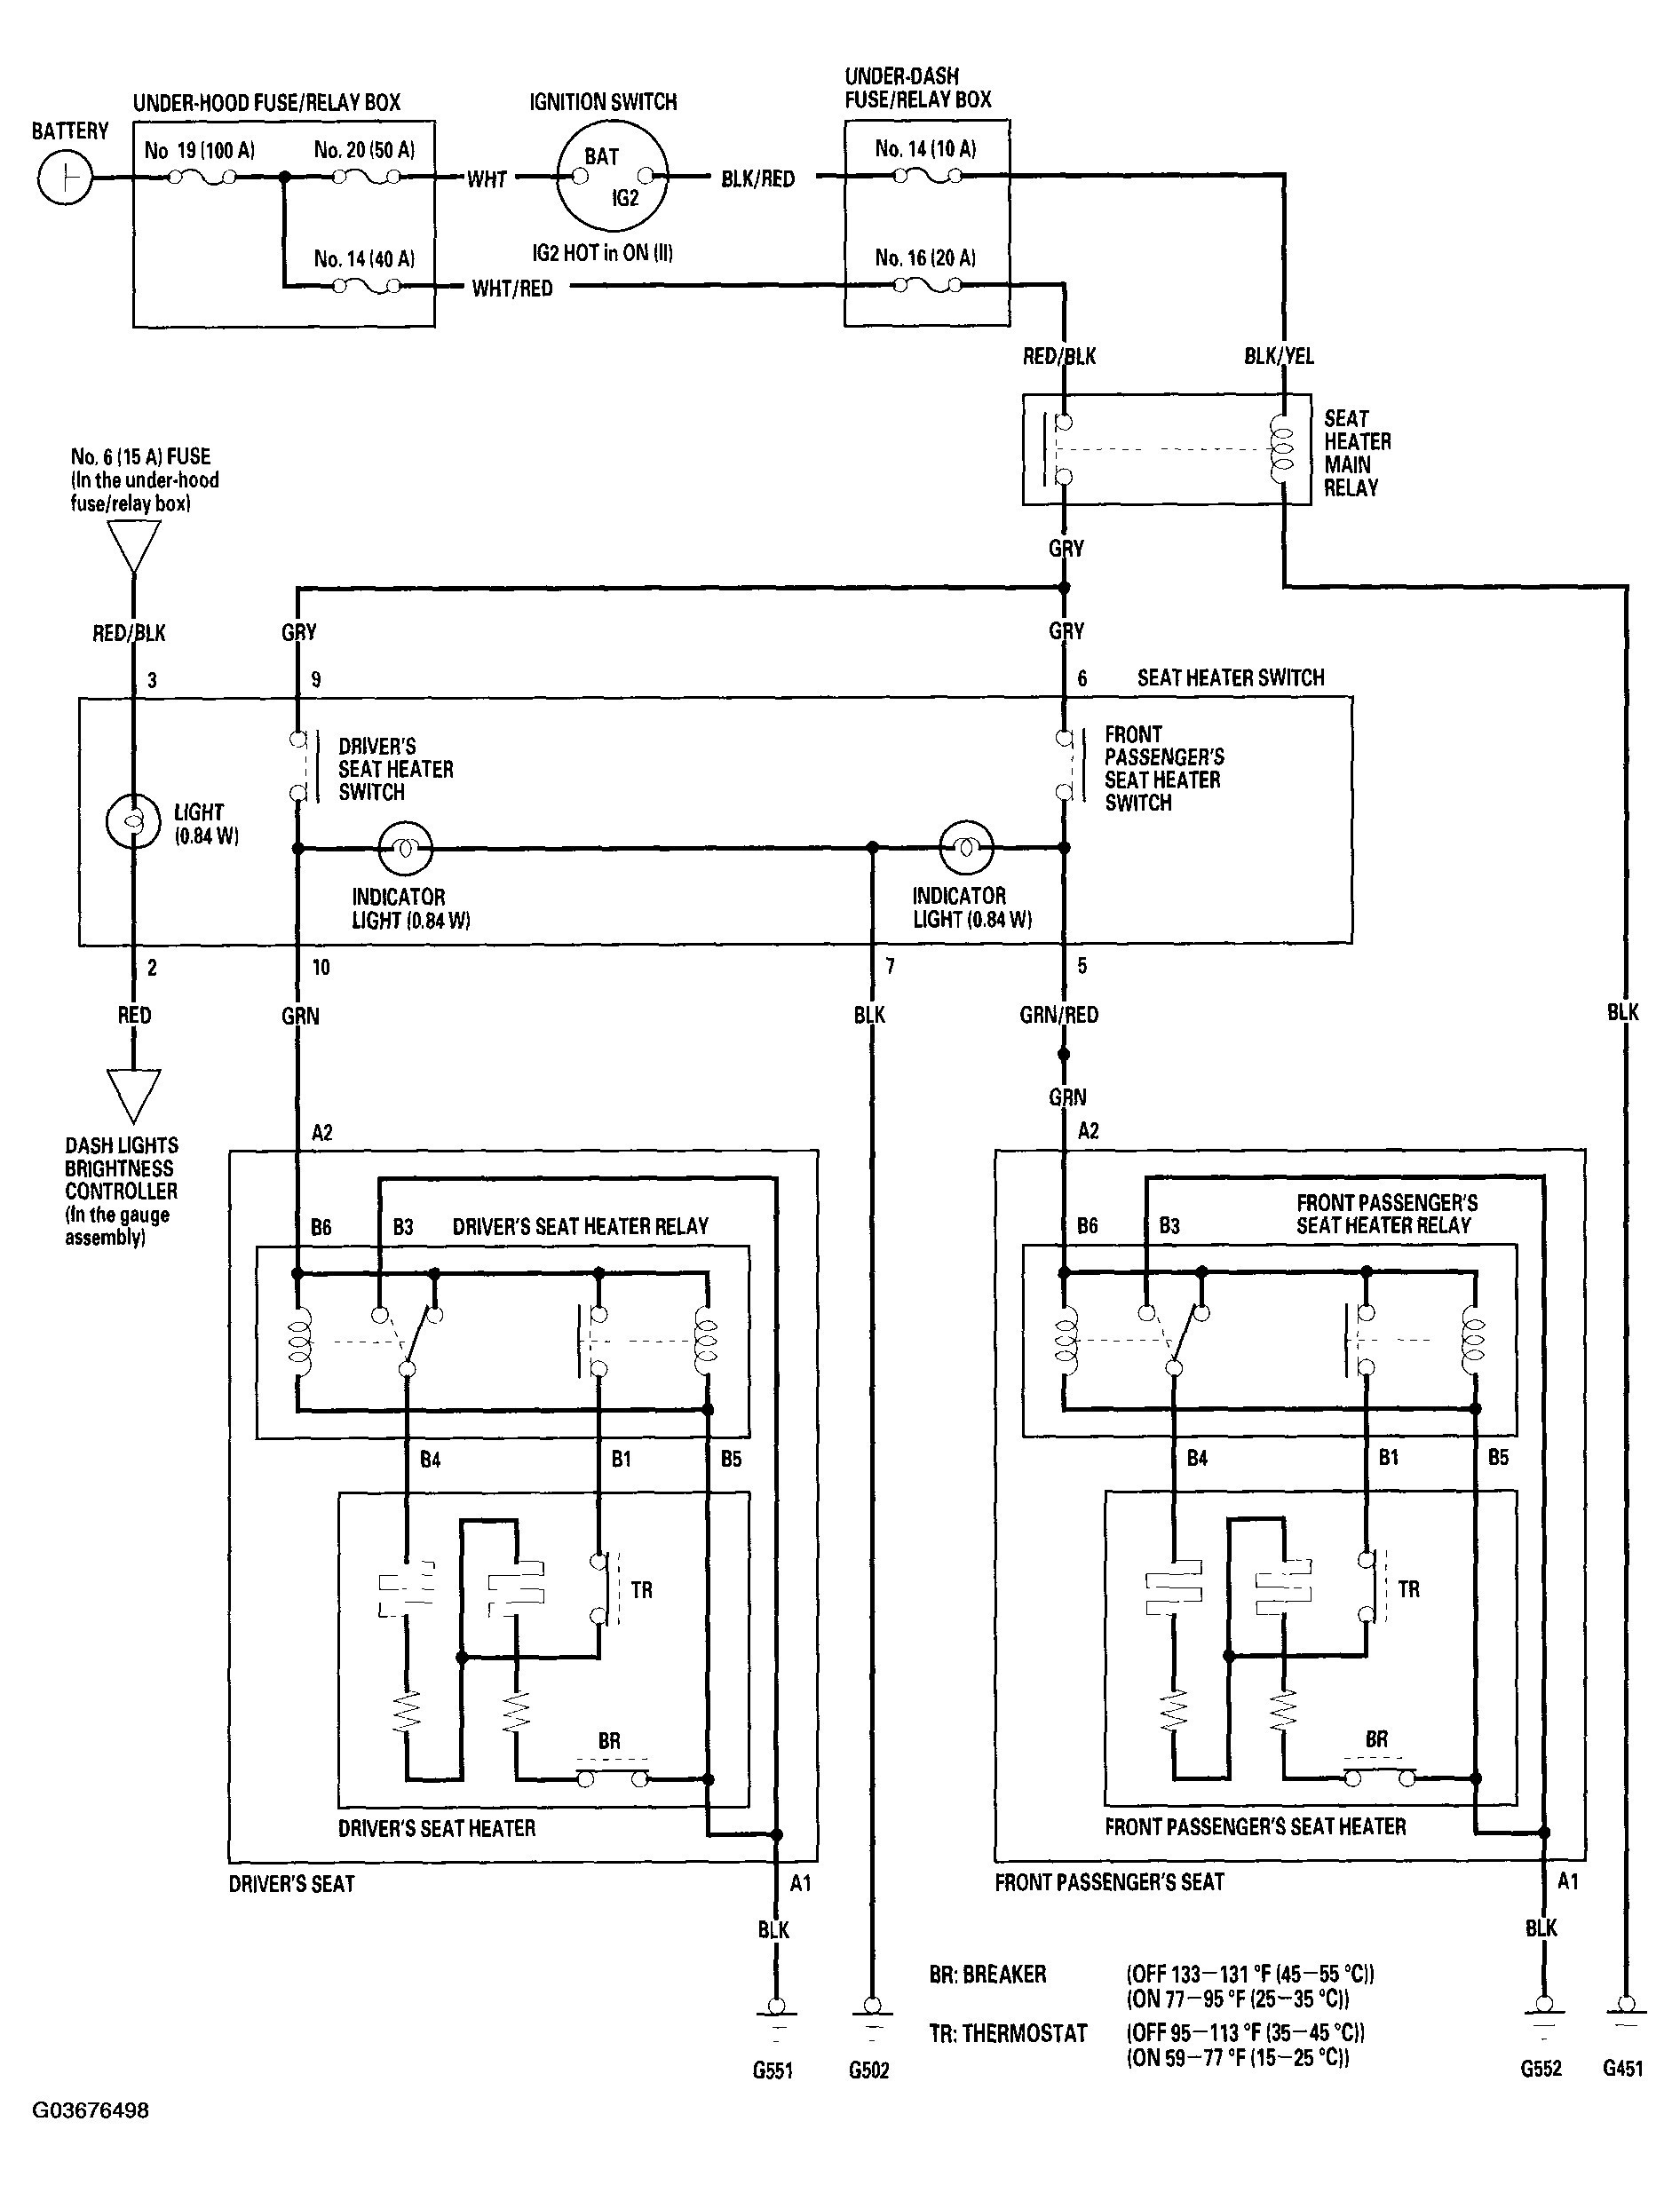 1997 Honda Crv Engine Diagram Best 2006 Honda Civic Relay Diagram • Electrical Outlet Symbol 2018 Of 1997 Honda Crv Engine Diagram